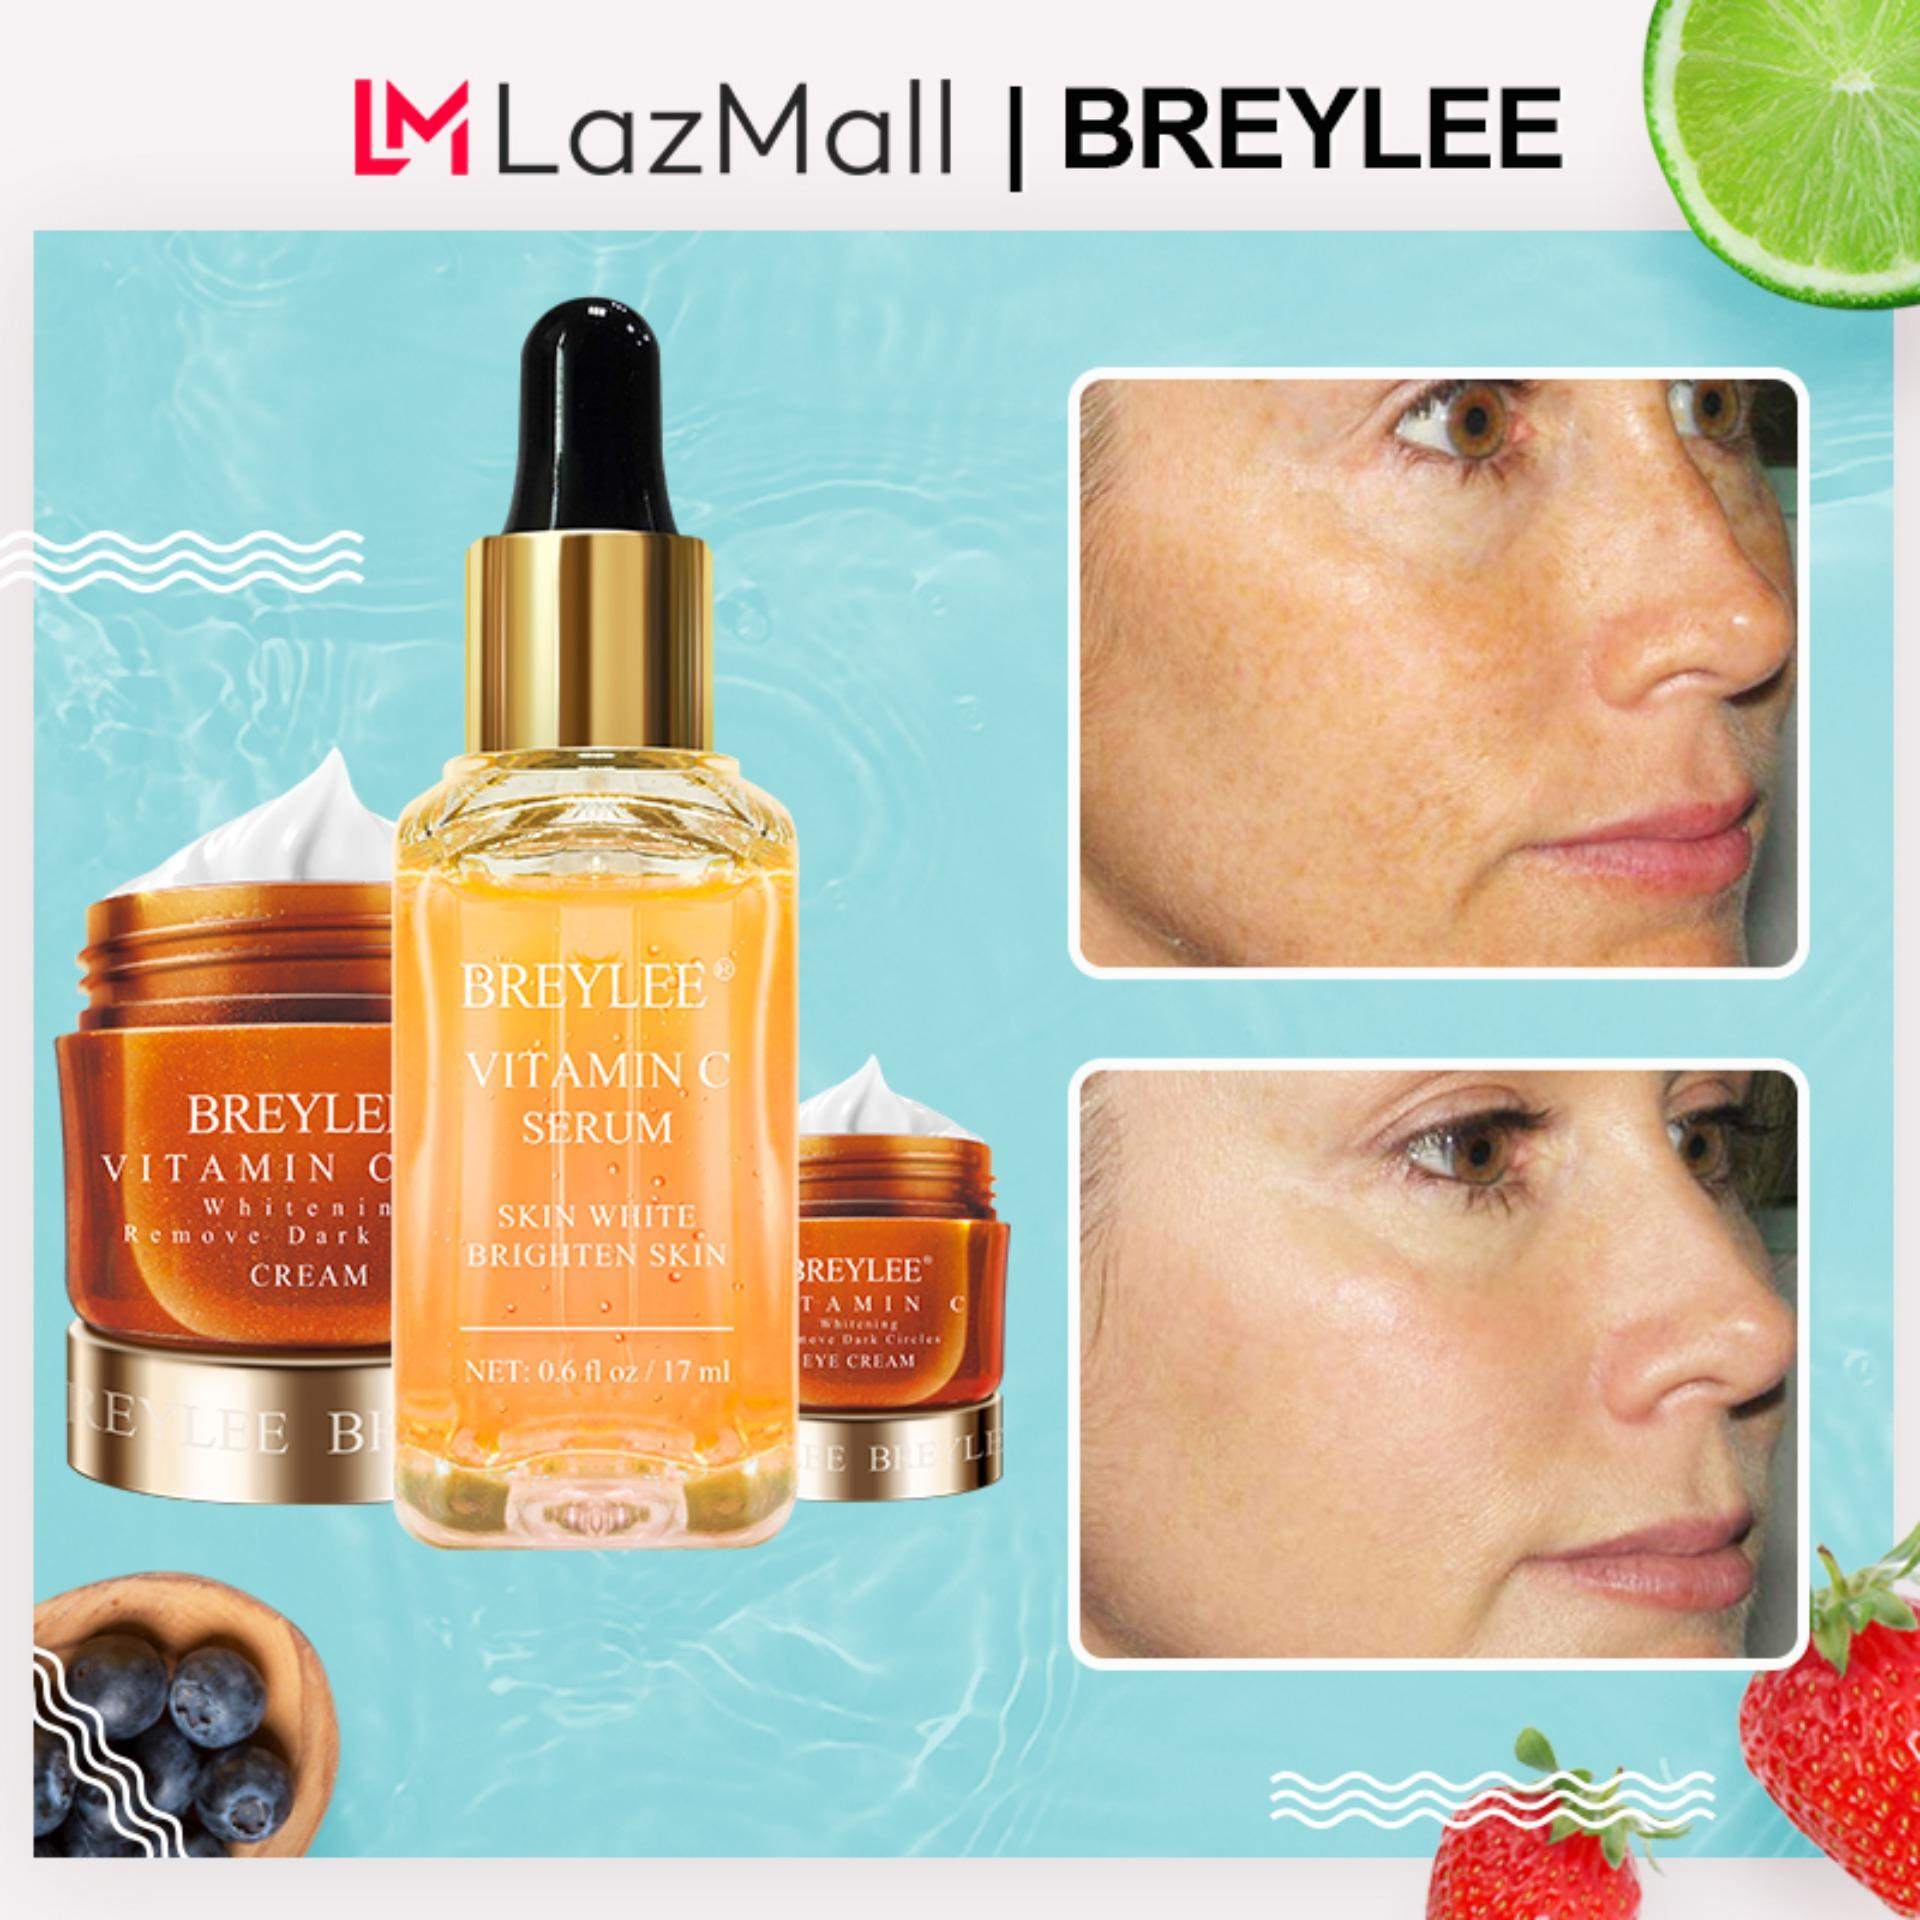 Breylee Vitamin C Whitening Set Wajah Serum Krim Mata Krim Wajah Menghilangkan Lingkaran Hitam Memudar Bintik-bintik Tempat Melanin Kulit